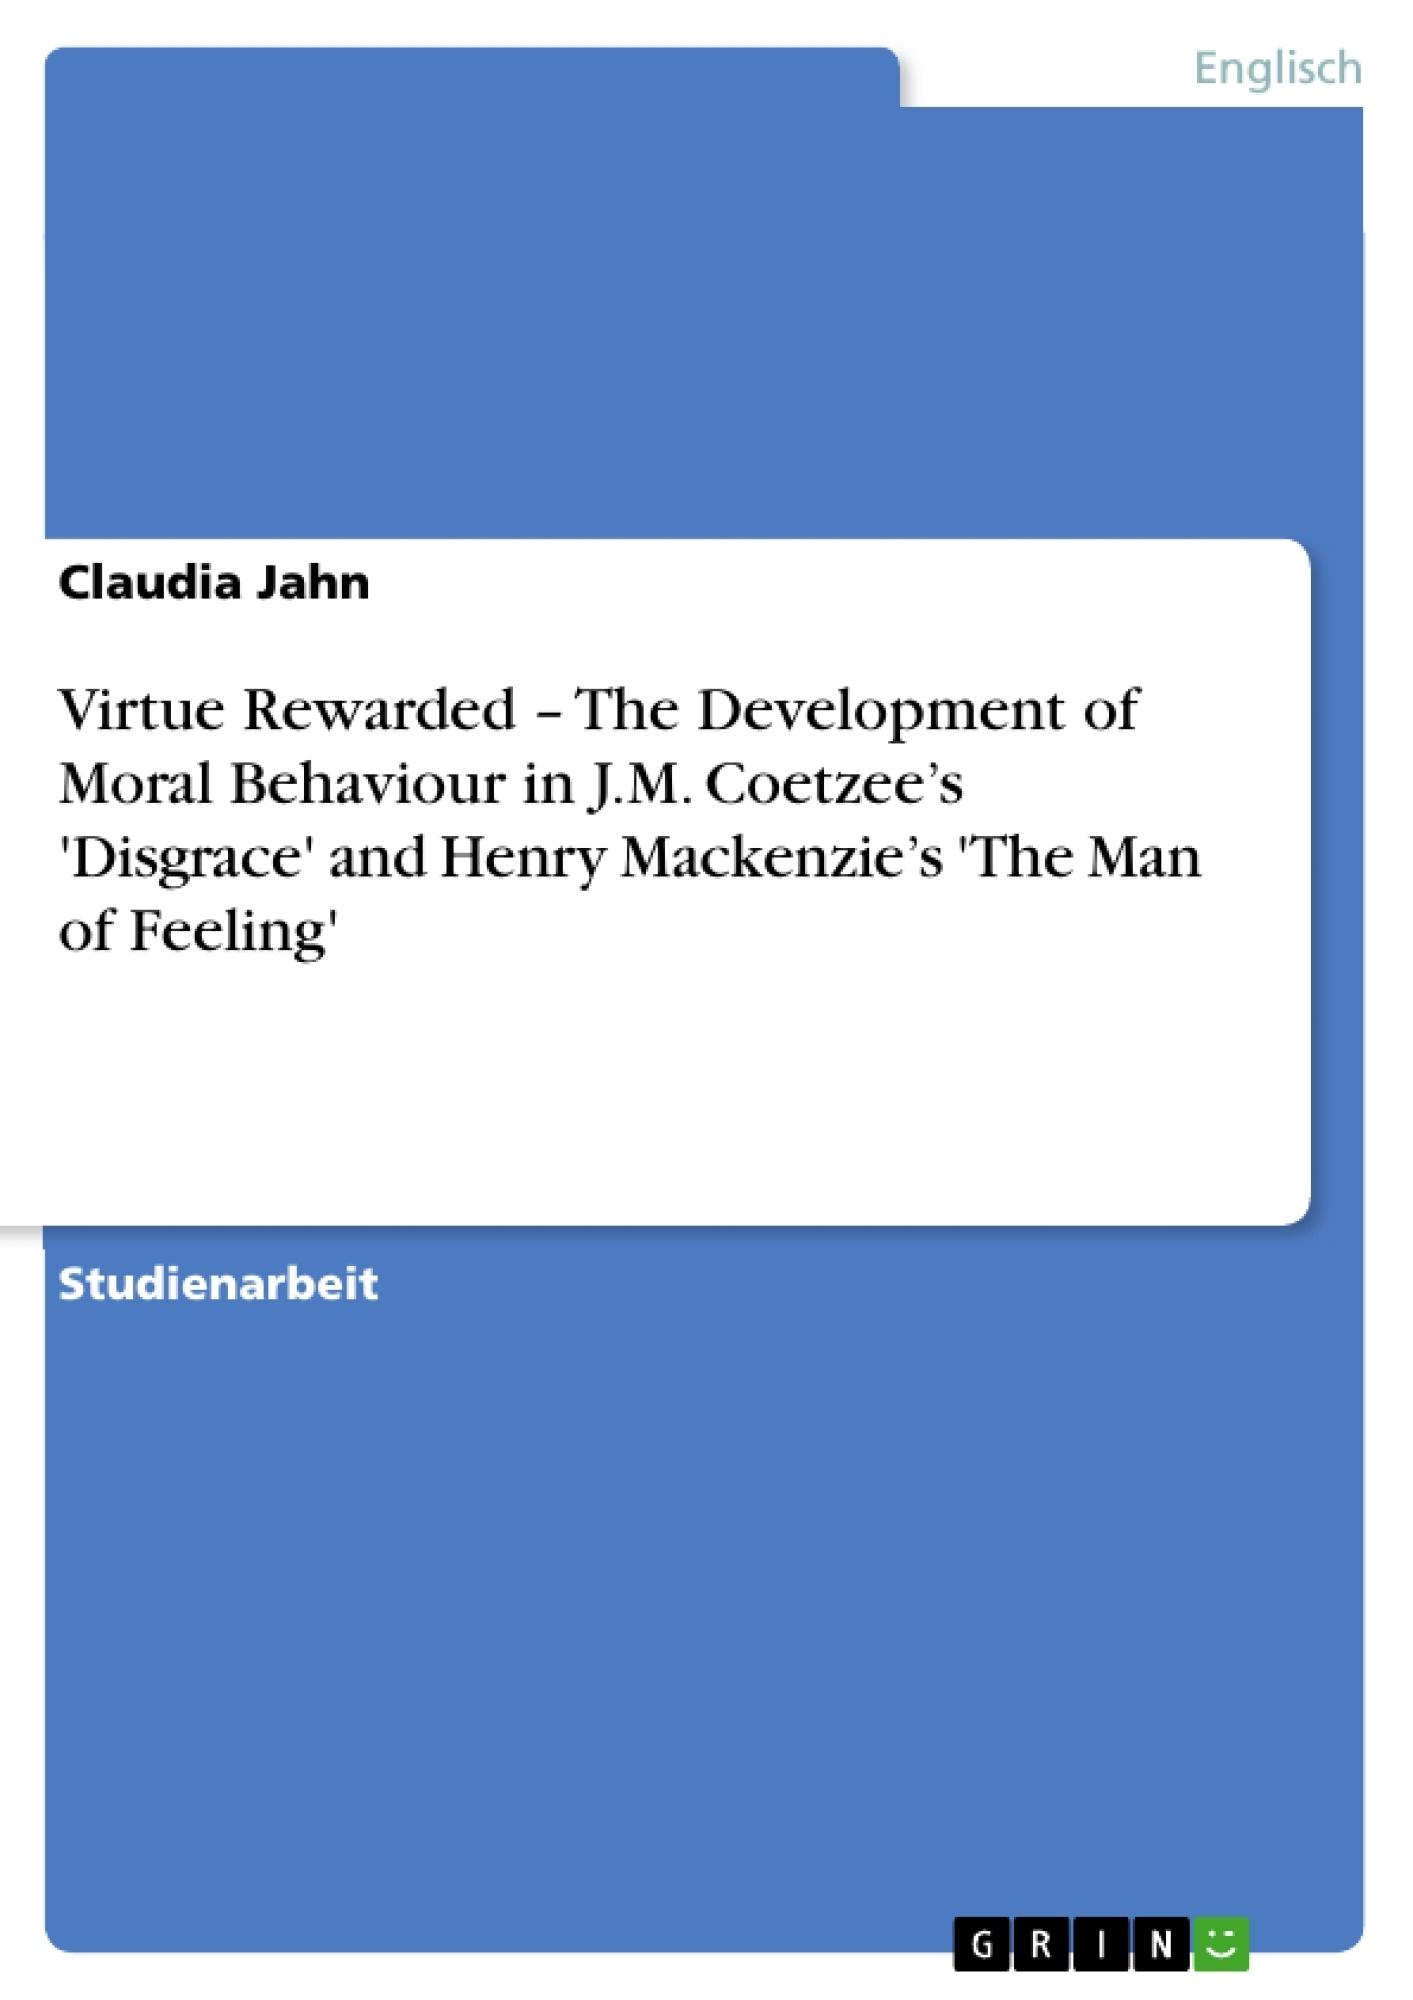 Titel: Virtue Rewarded – The Development of Moral Behaviour in J.M. Coetzee's 'Disgrace' and Henry Mackenzie's 'The Man of Feeling'